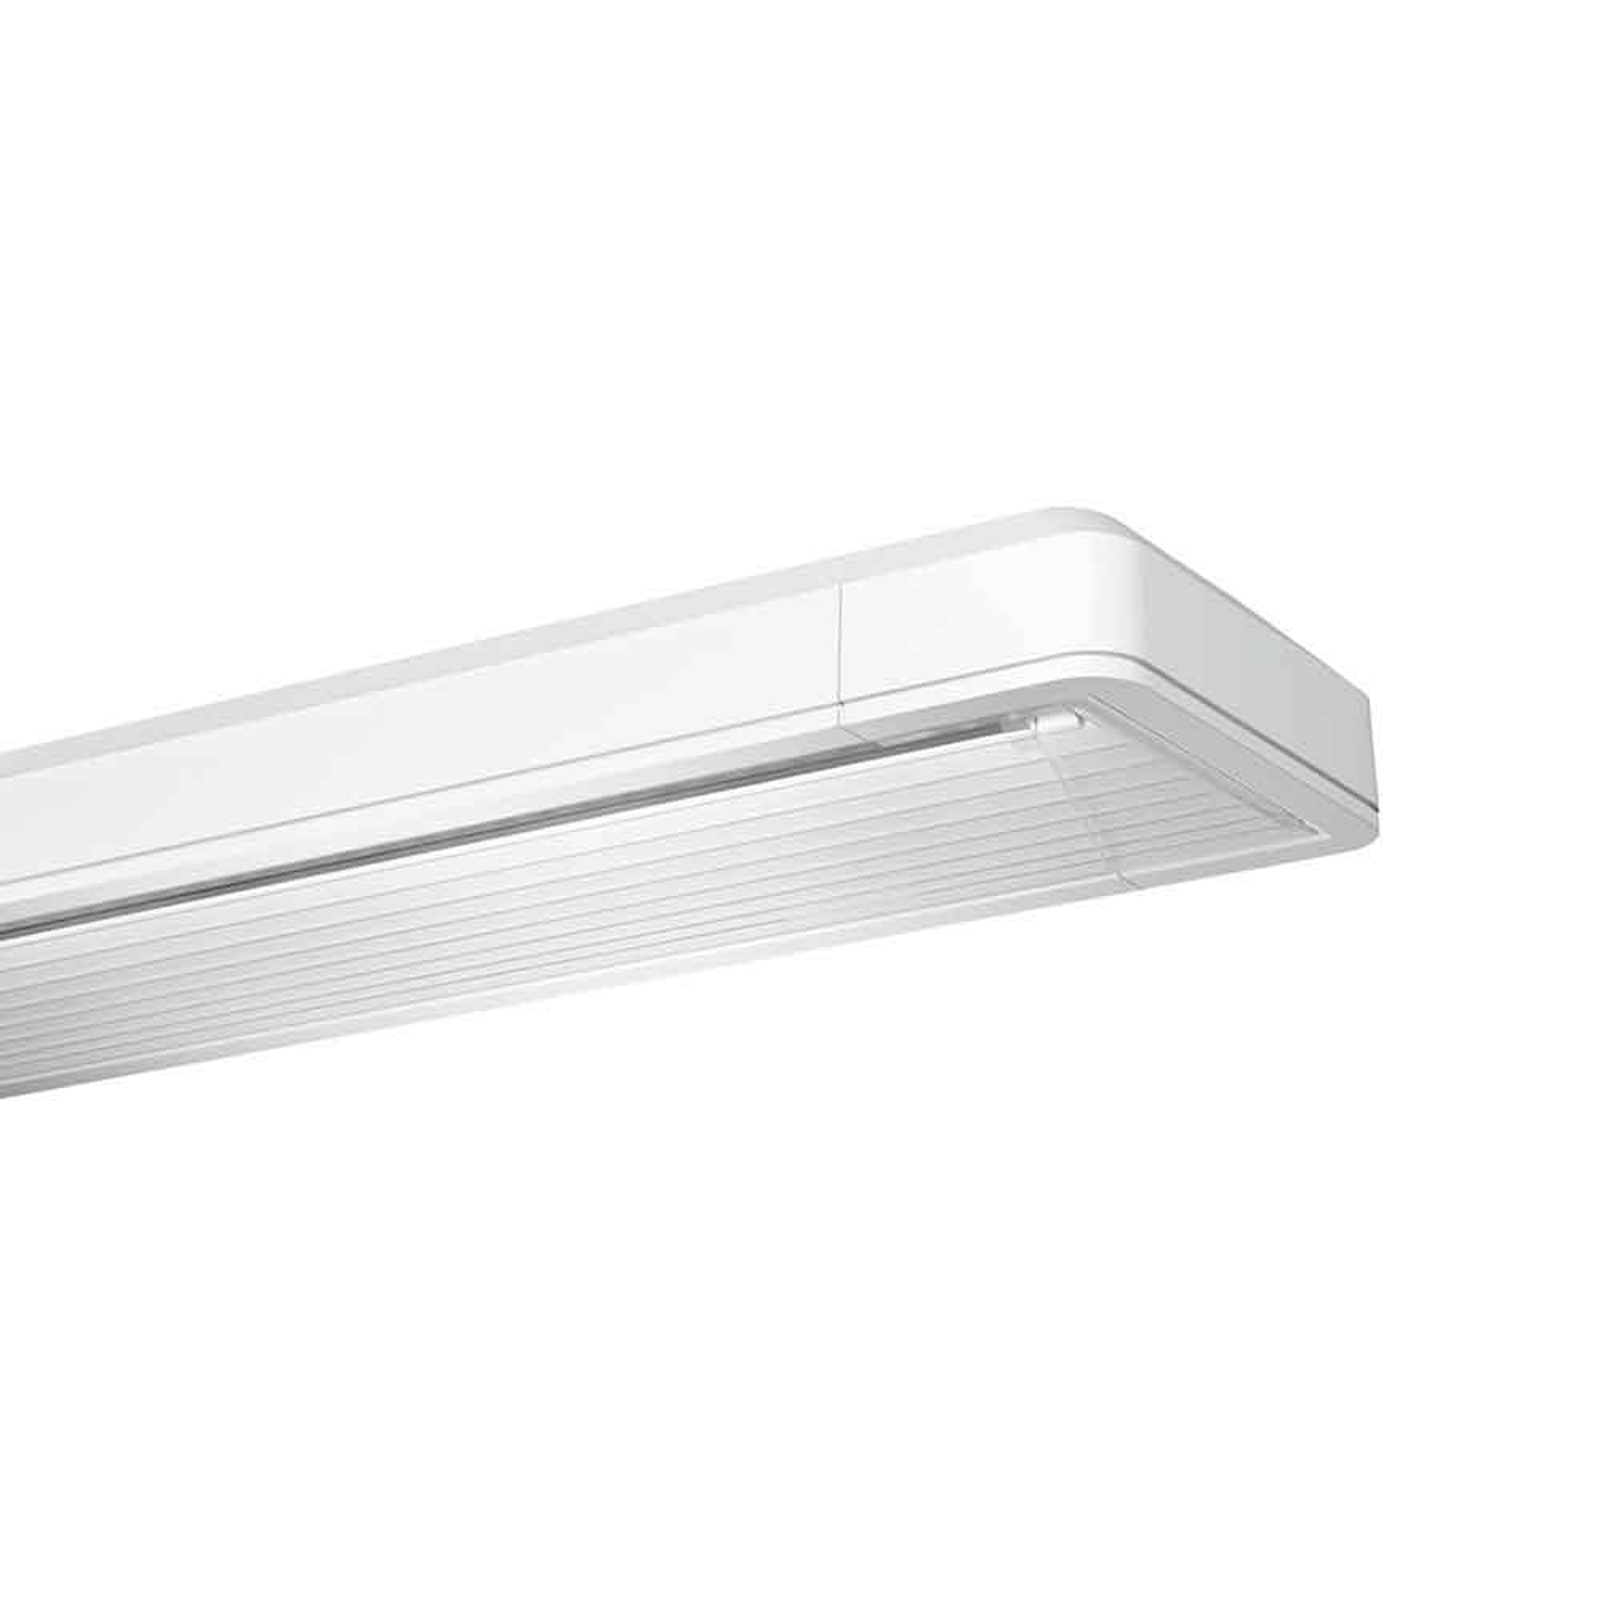 Siteco Taris lampa sufitowa LED 151cm EVG